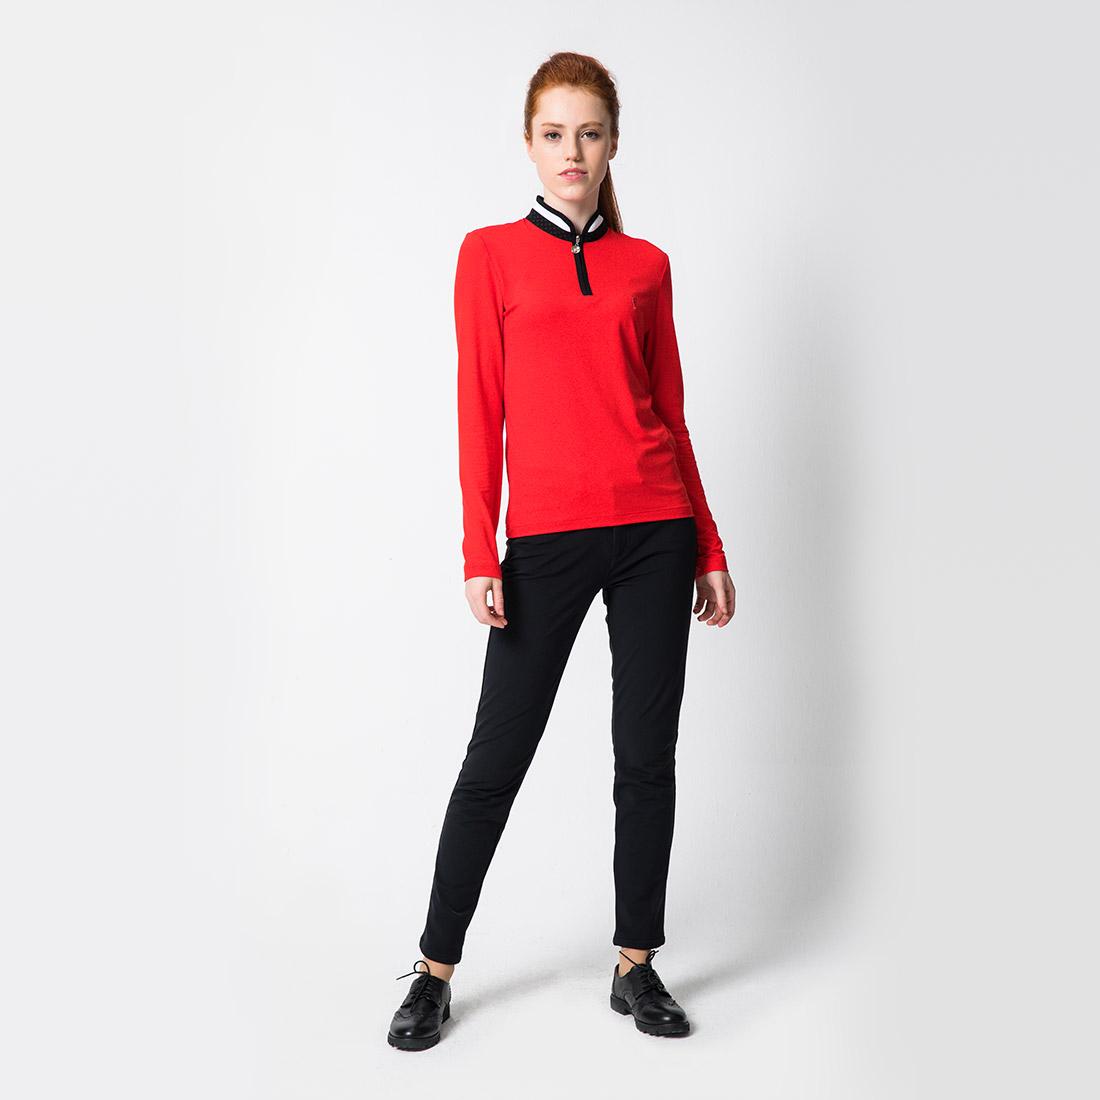 Damen Langarm Performance Golftroyer Dry Comfort in Slim Fit